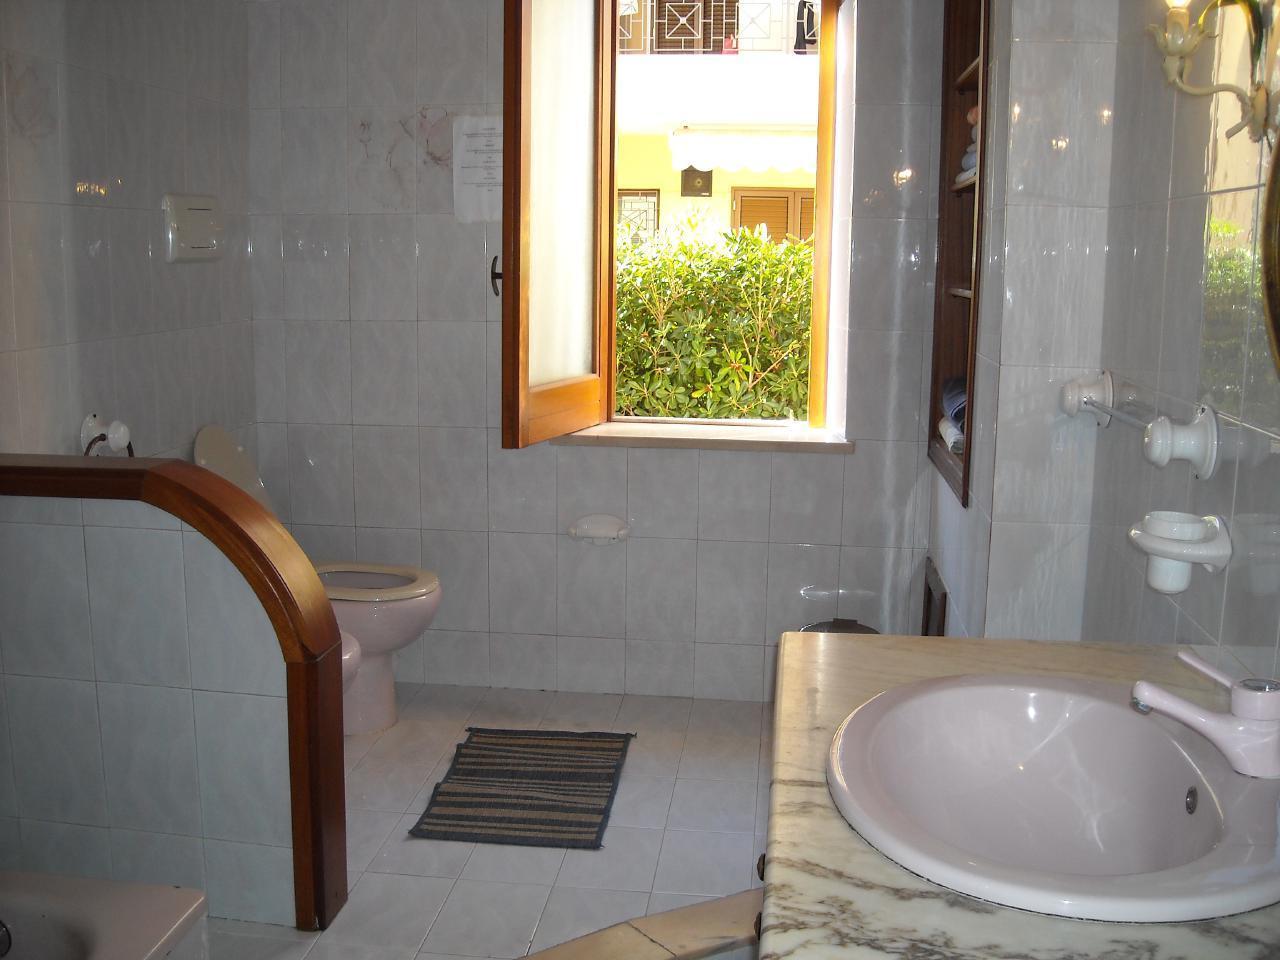 Maison de vacances Castellammare del Golfo Villalba A (34542), Castellammare del Golfo, Trapani, Sicile, Italie, image 18